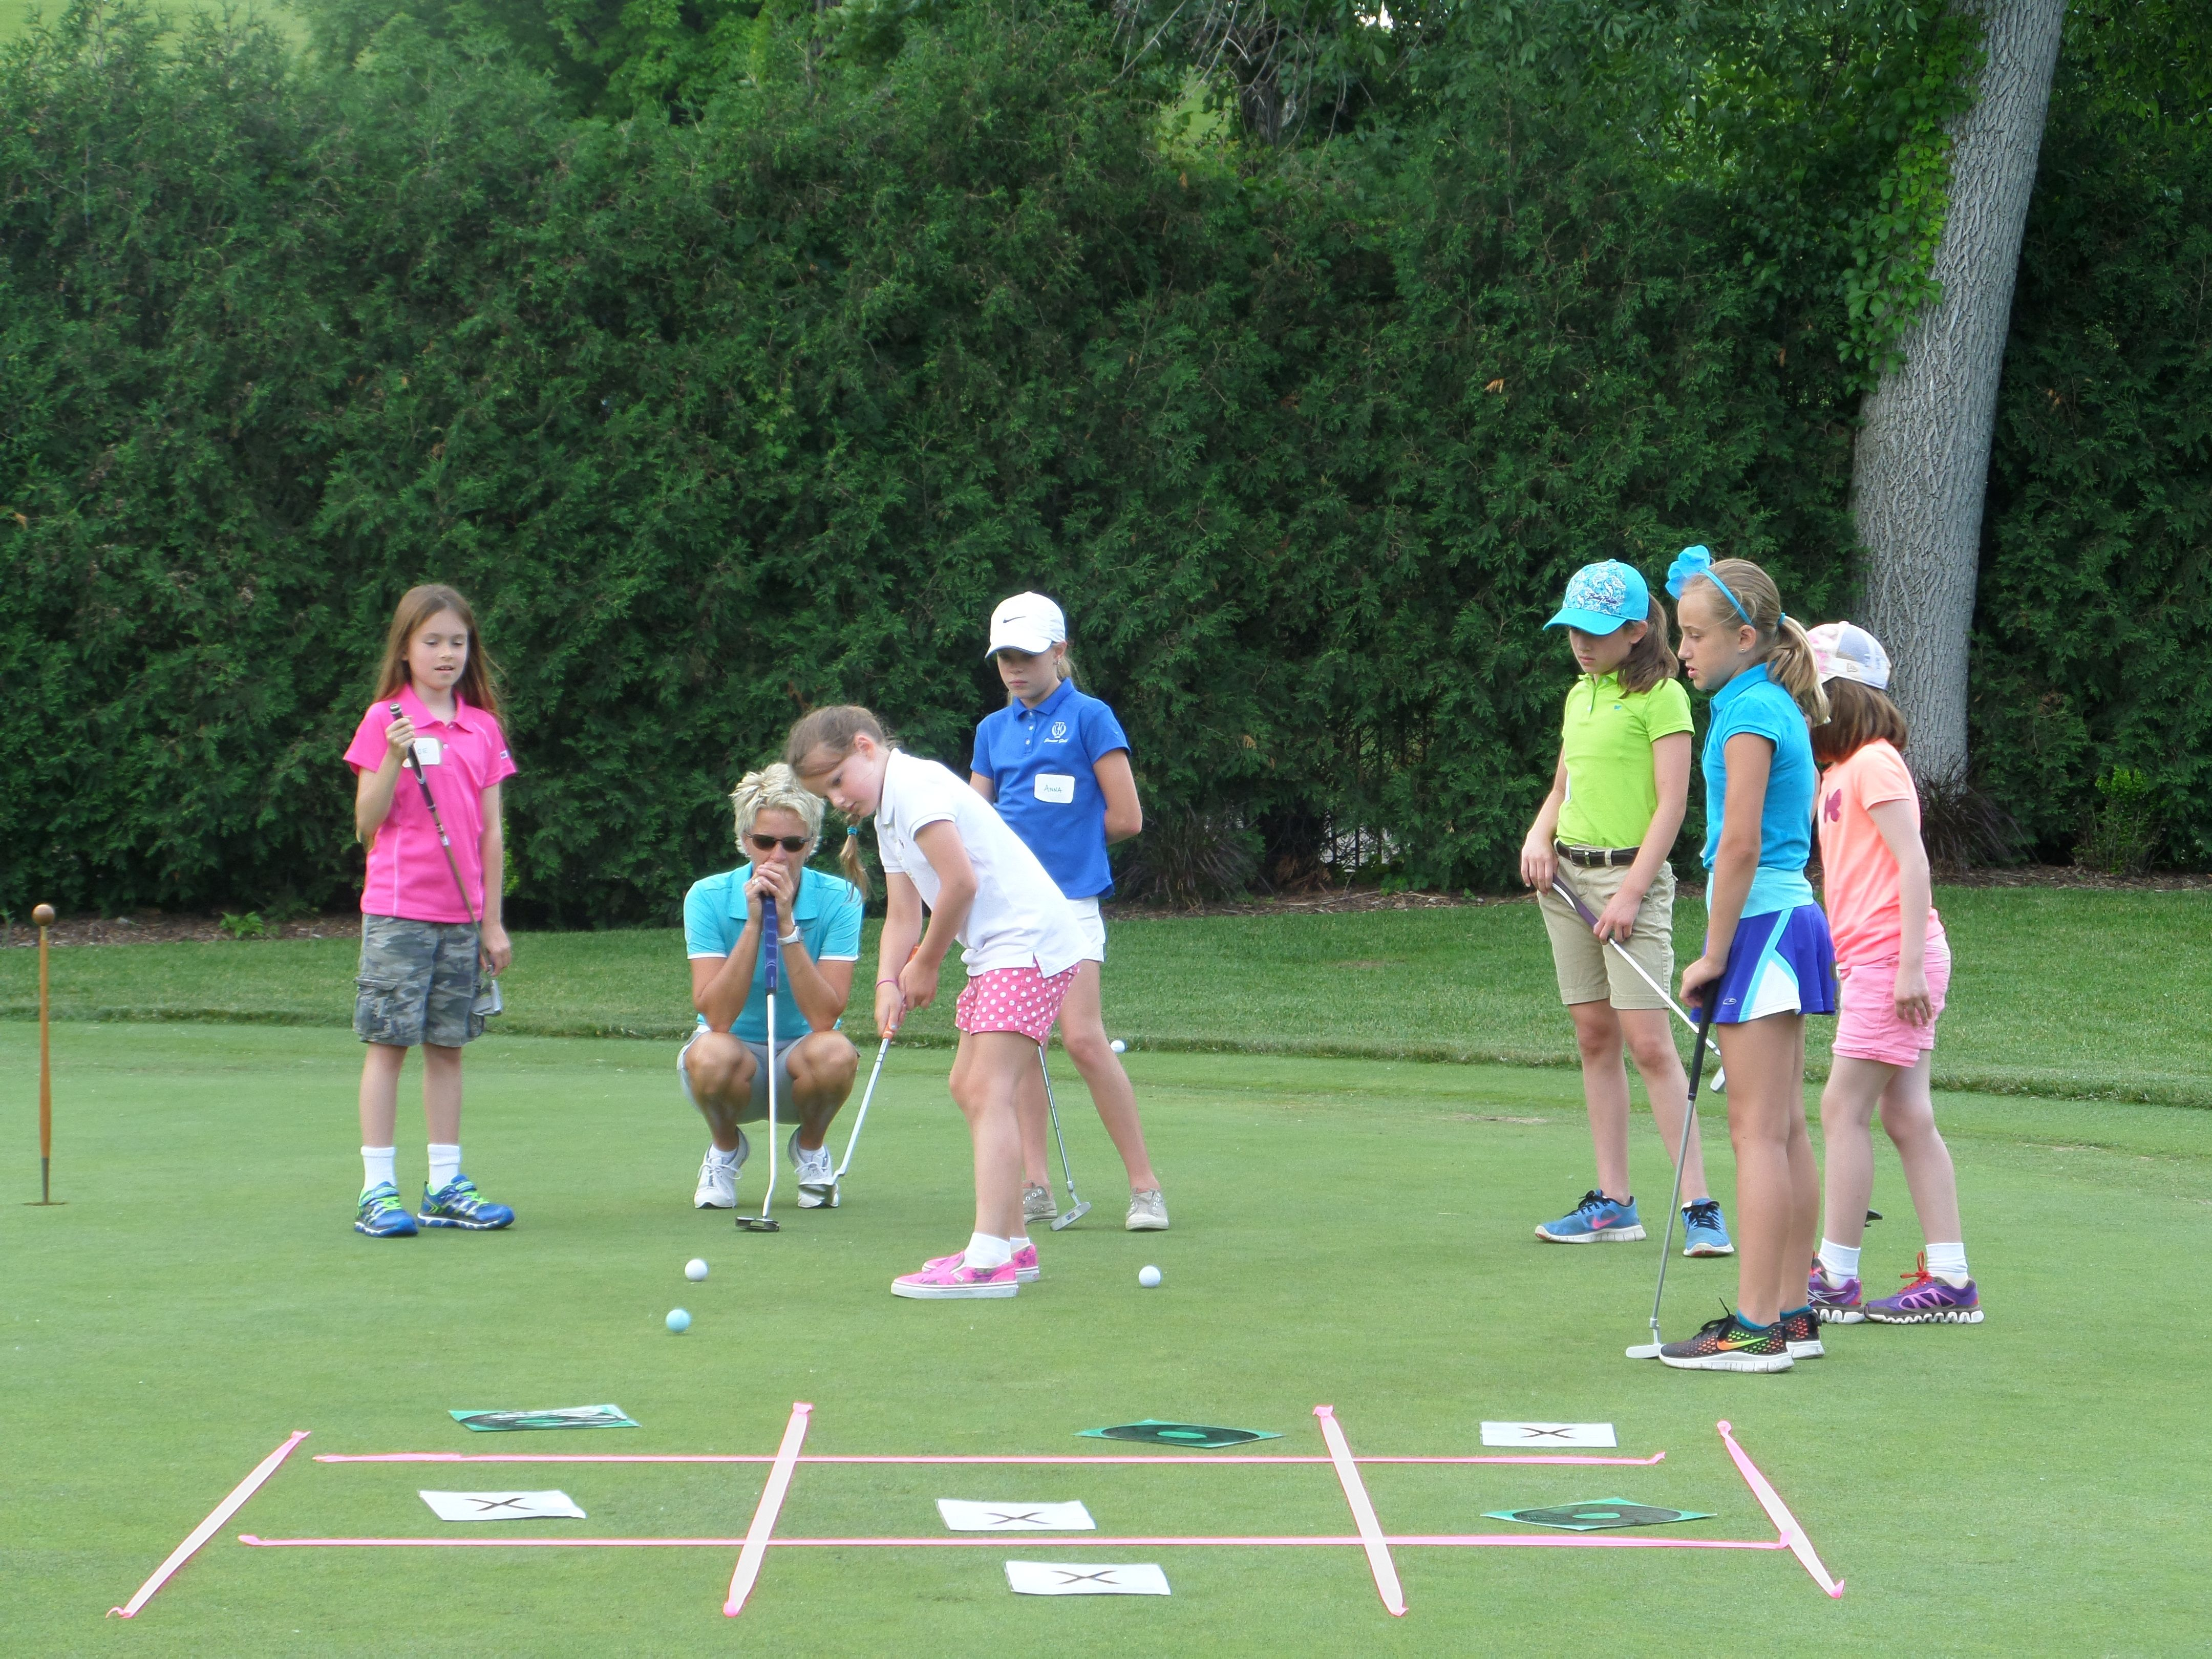 tic tac toe junior golf game at town u0026 country club of st paul